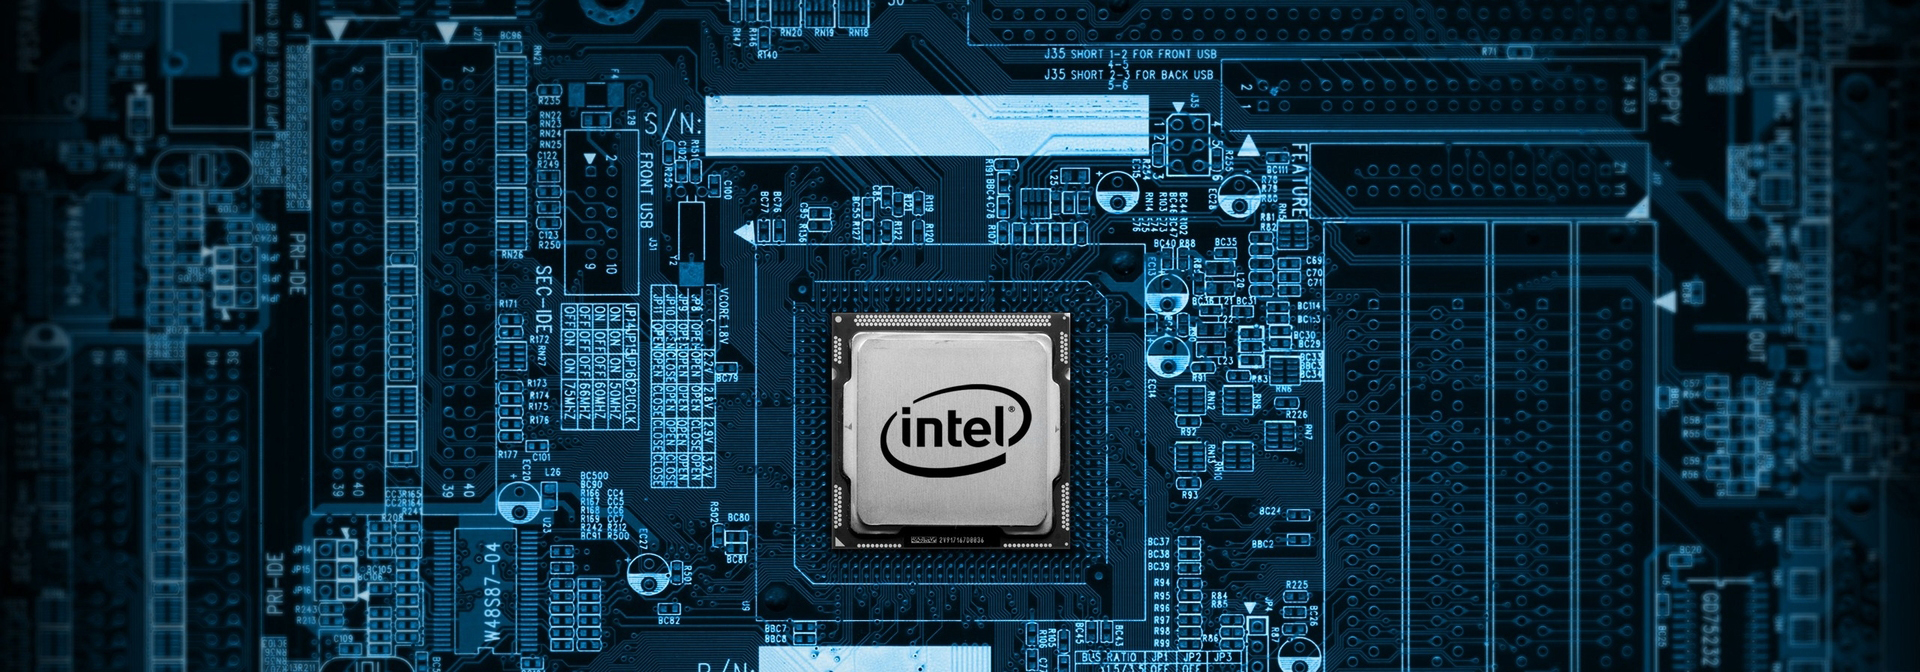 computer motherboard circuit diagram  science  fiction